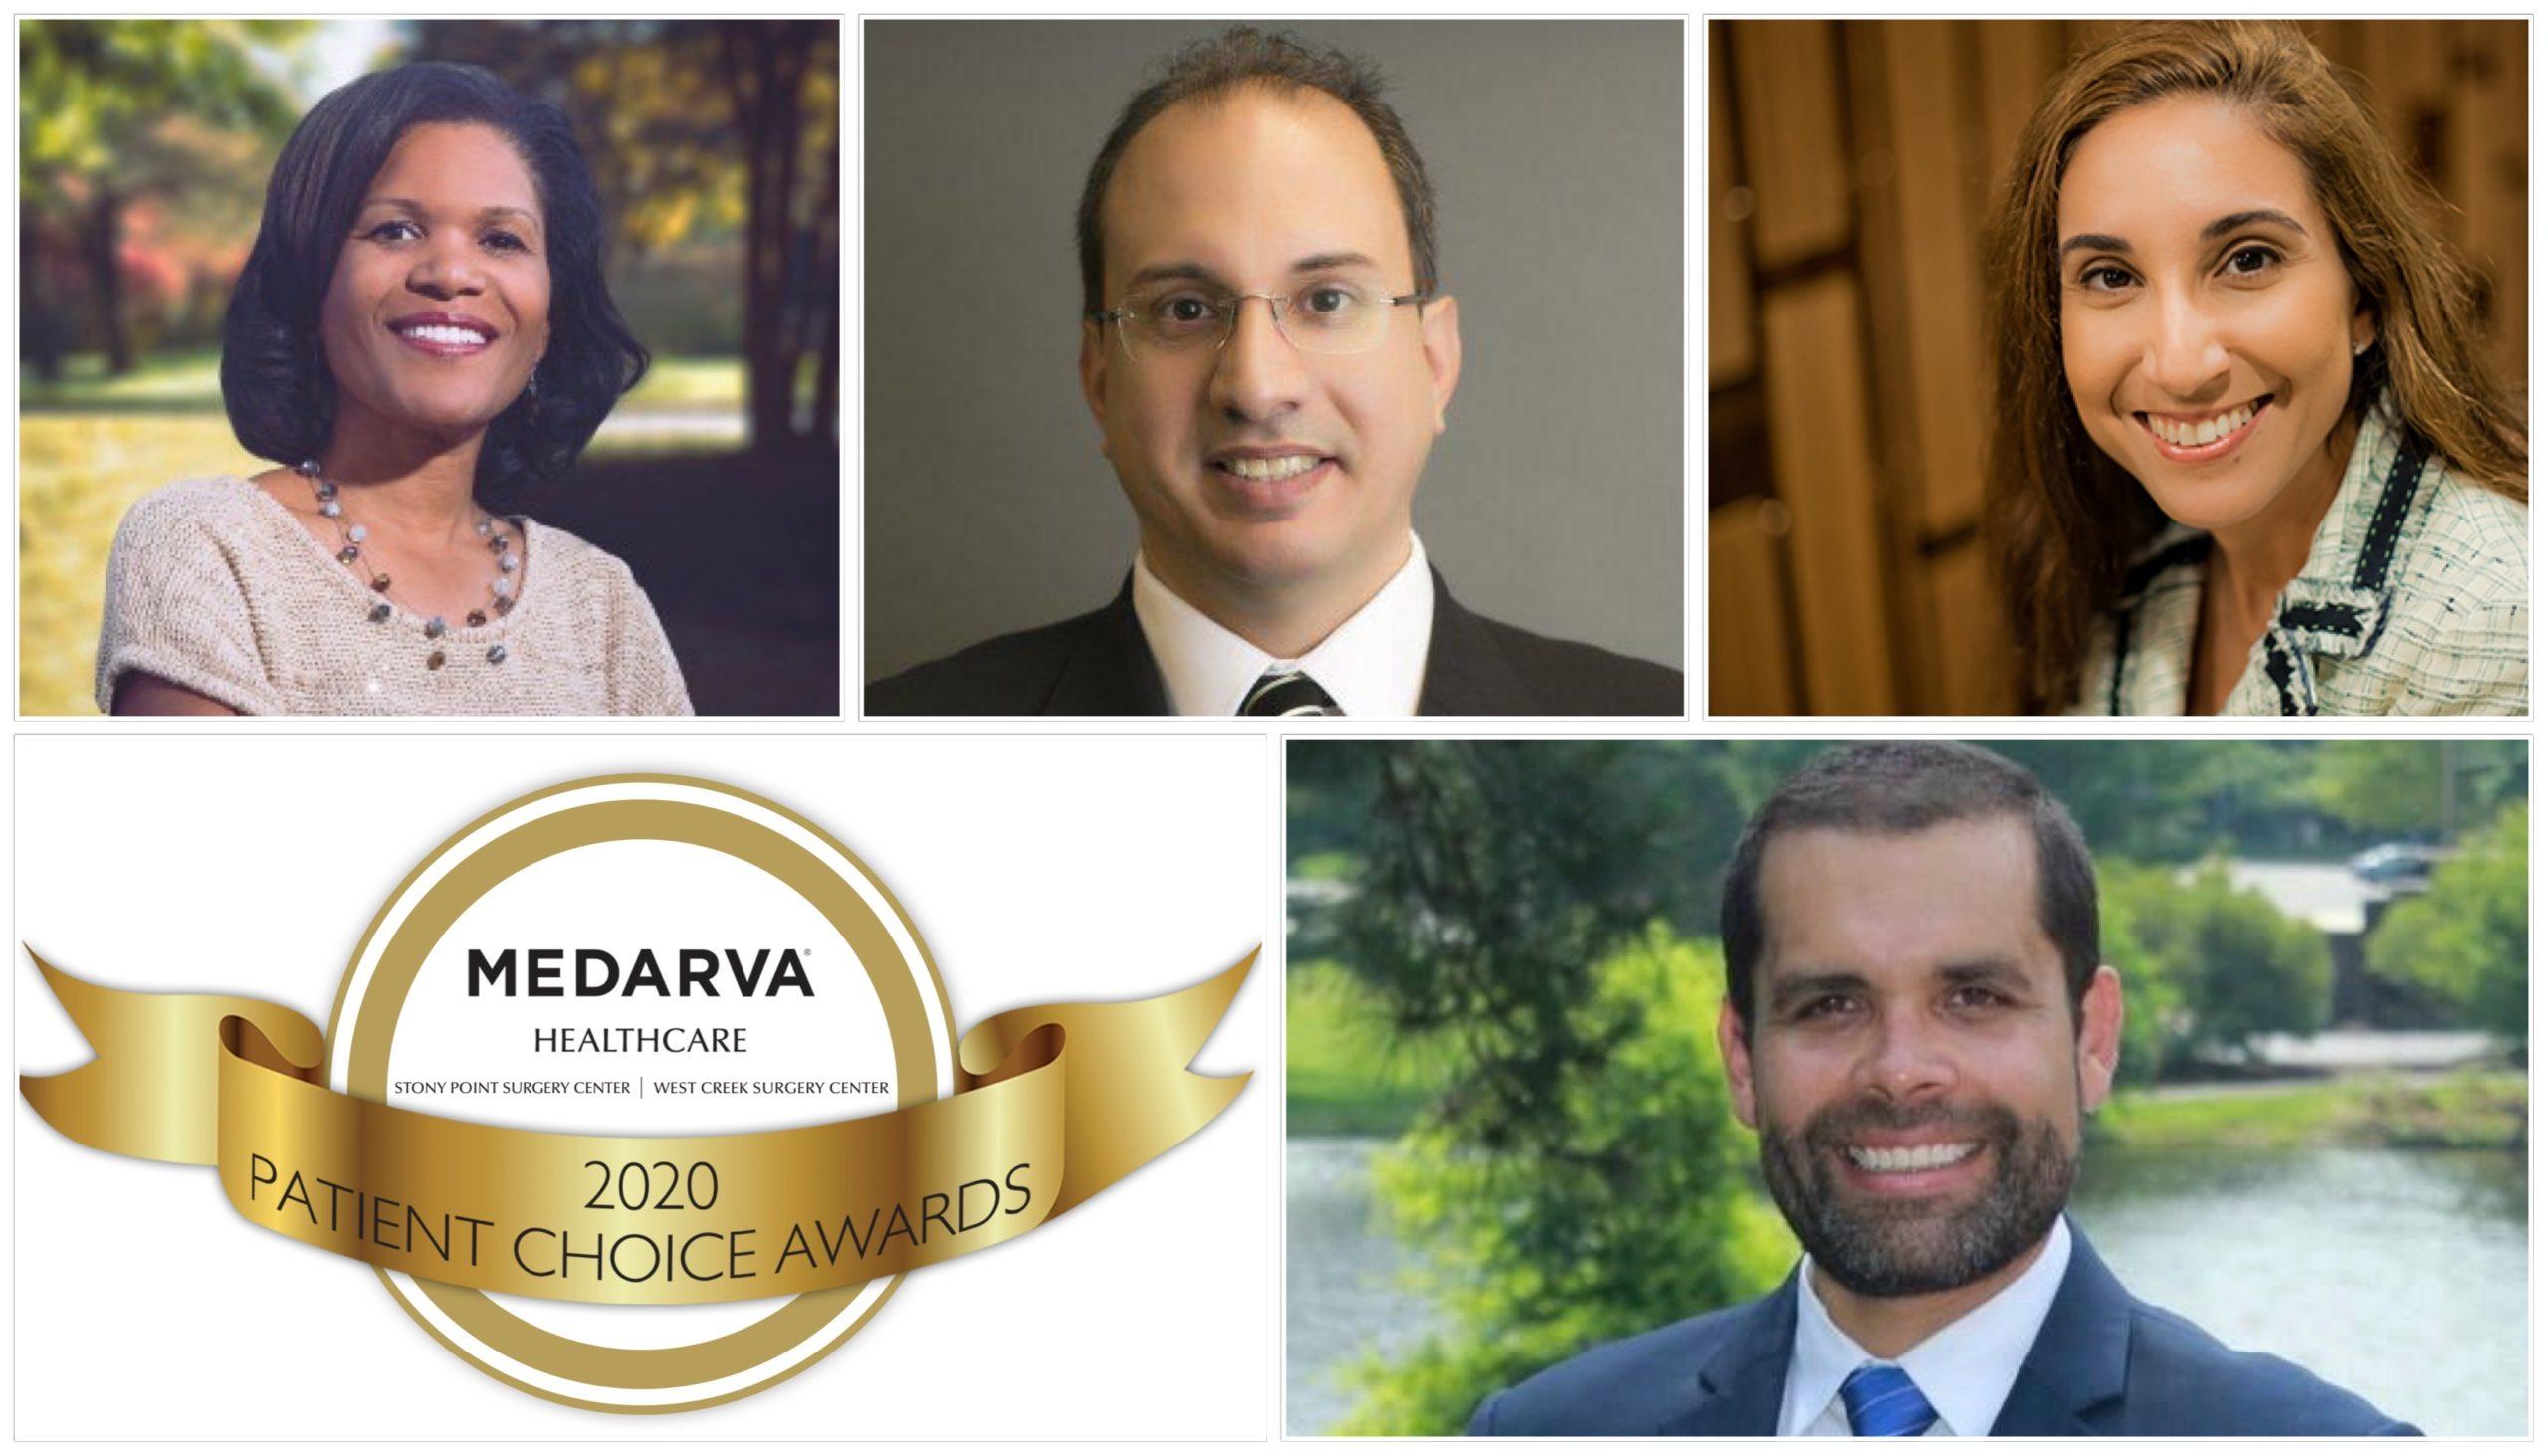 MEDARVA Announces Patient Choice Awards Recipients